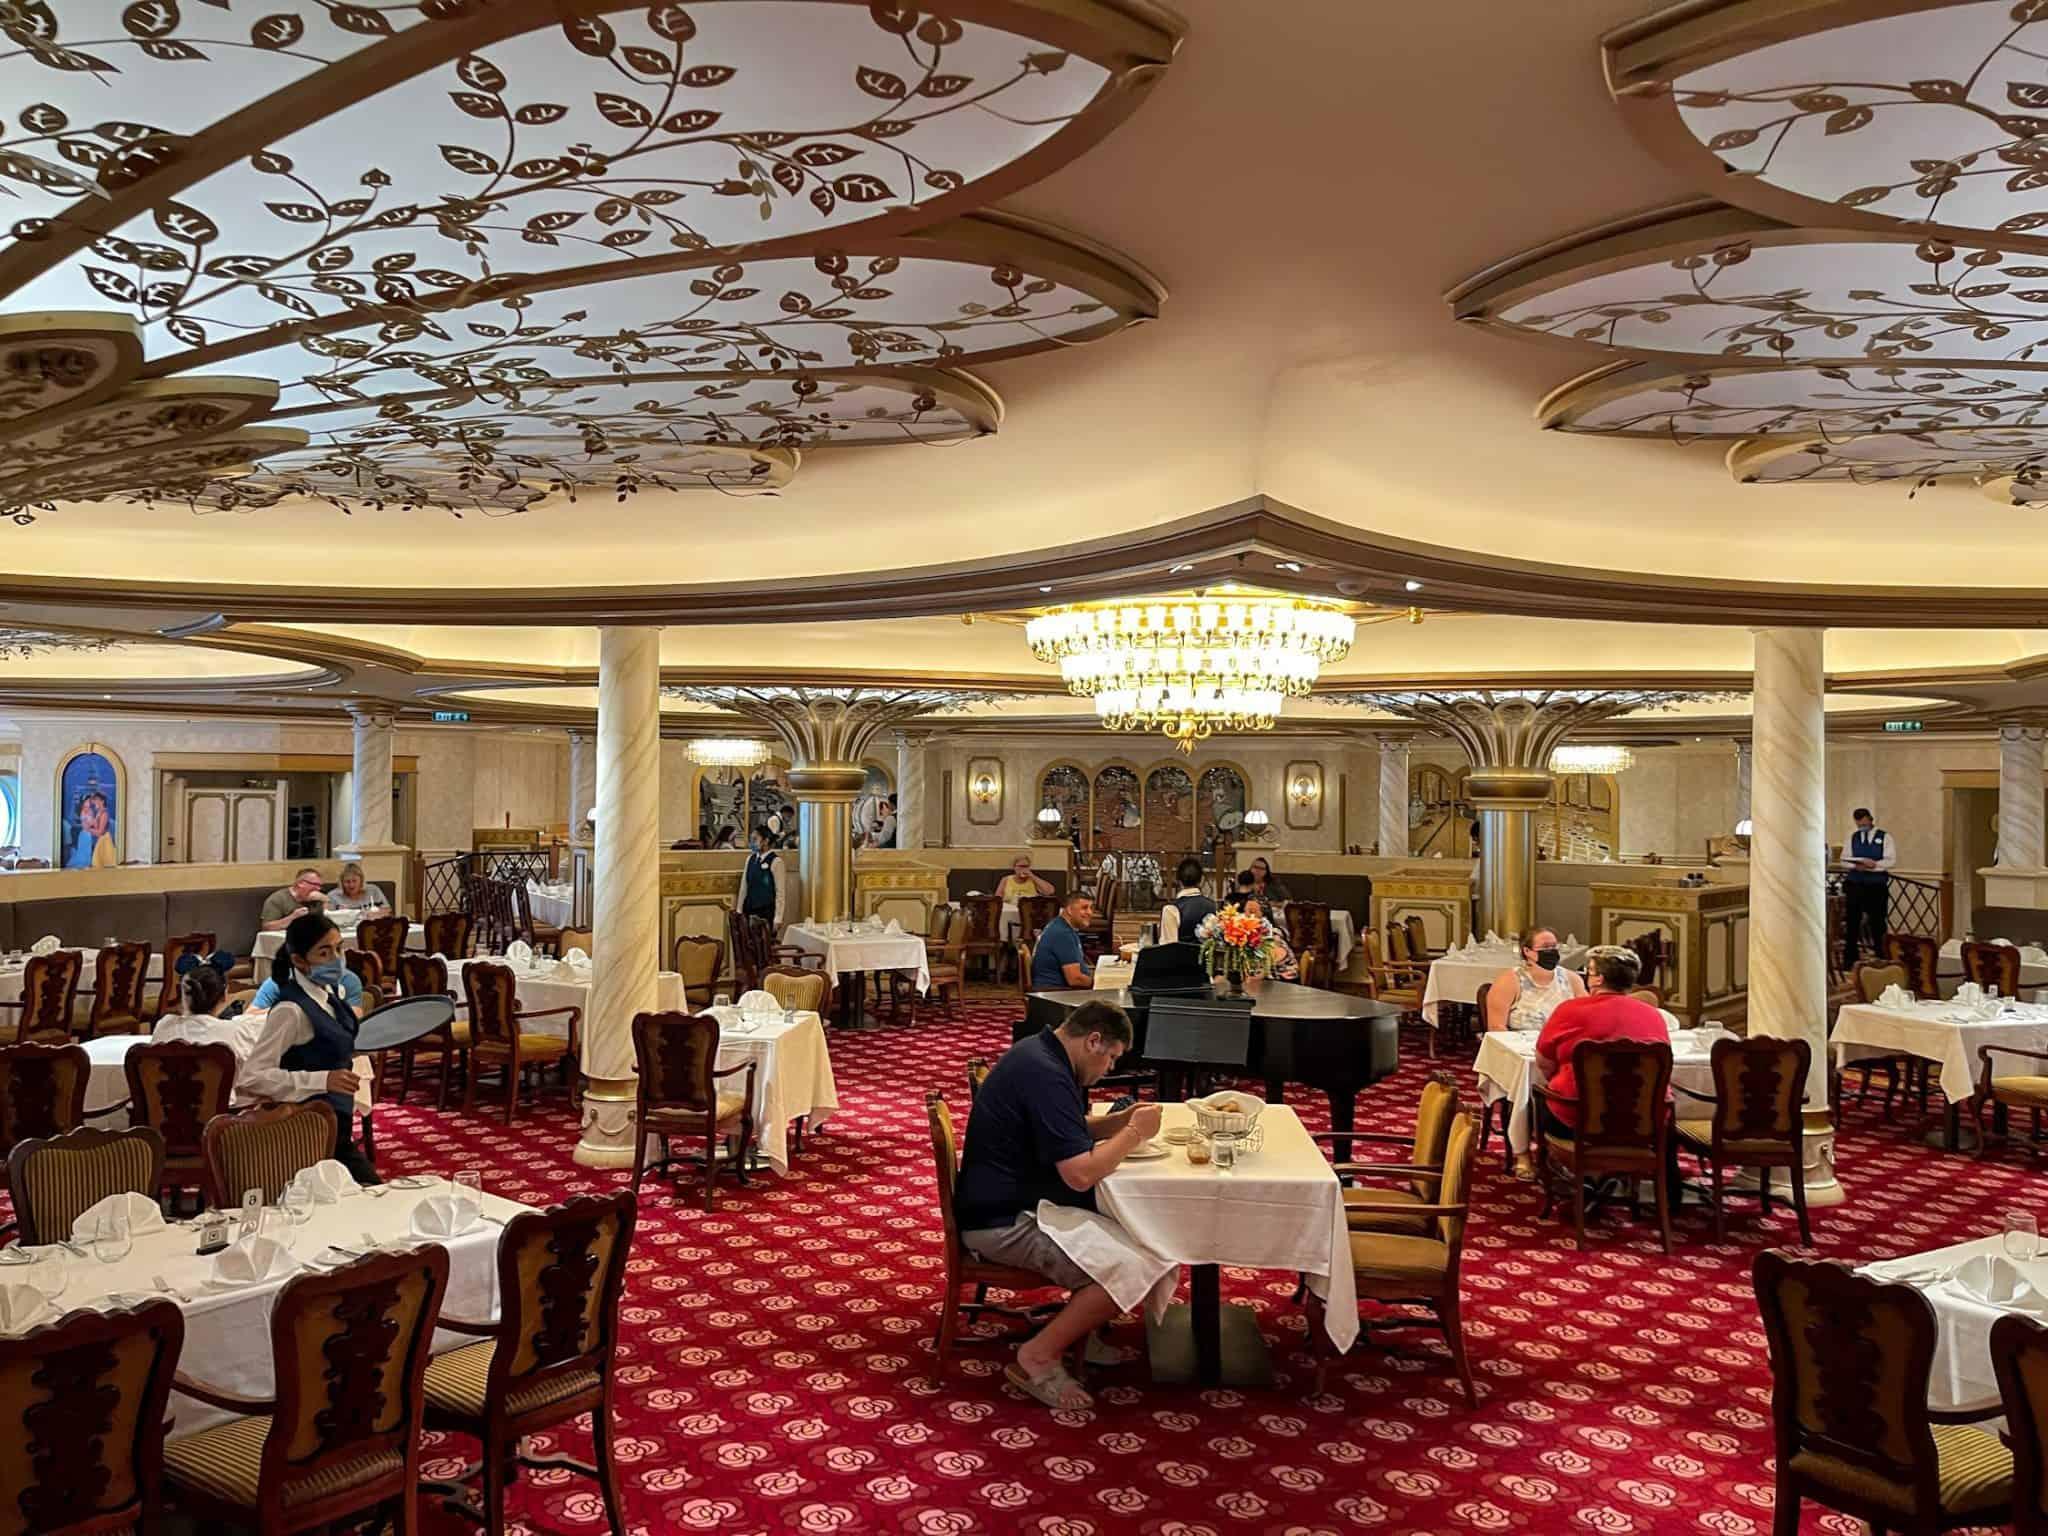 royal court dining room disney fantasy